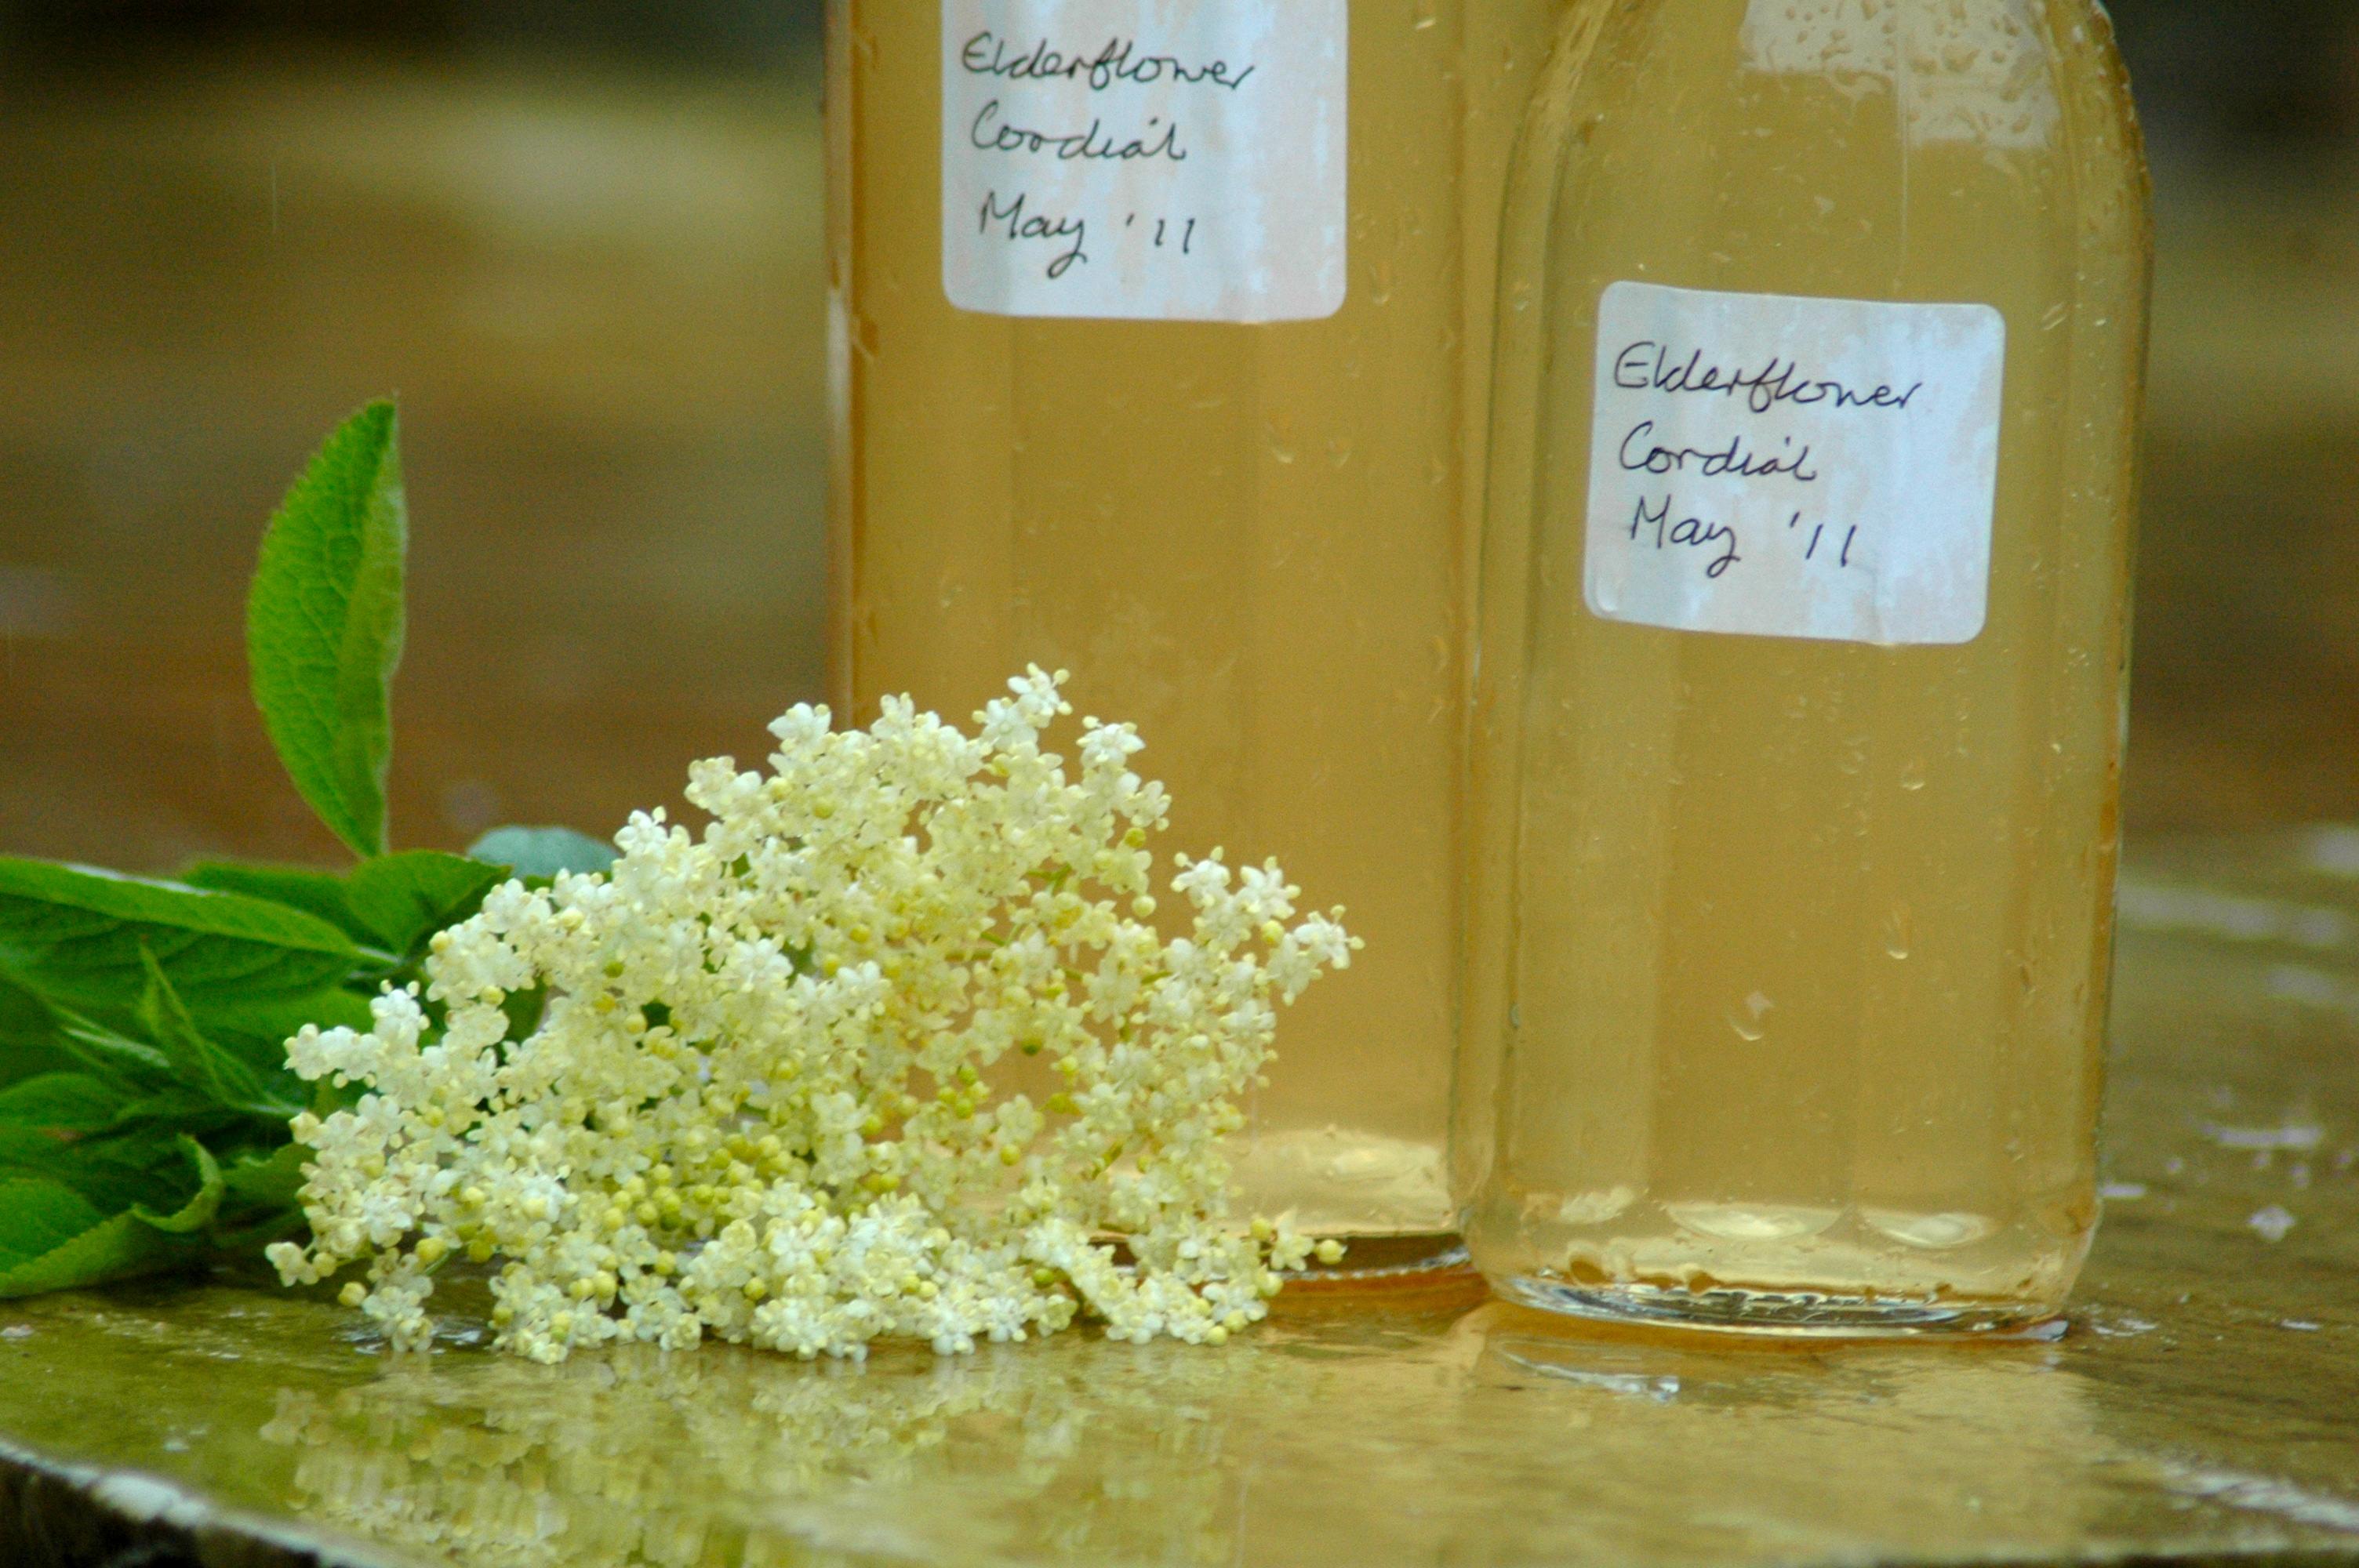 recipes: elderflower cordial, elderflower tea | suzanne askham